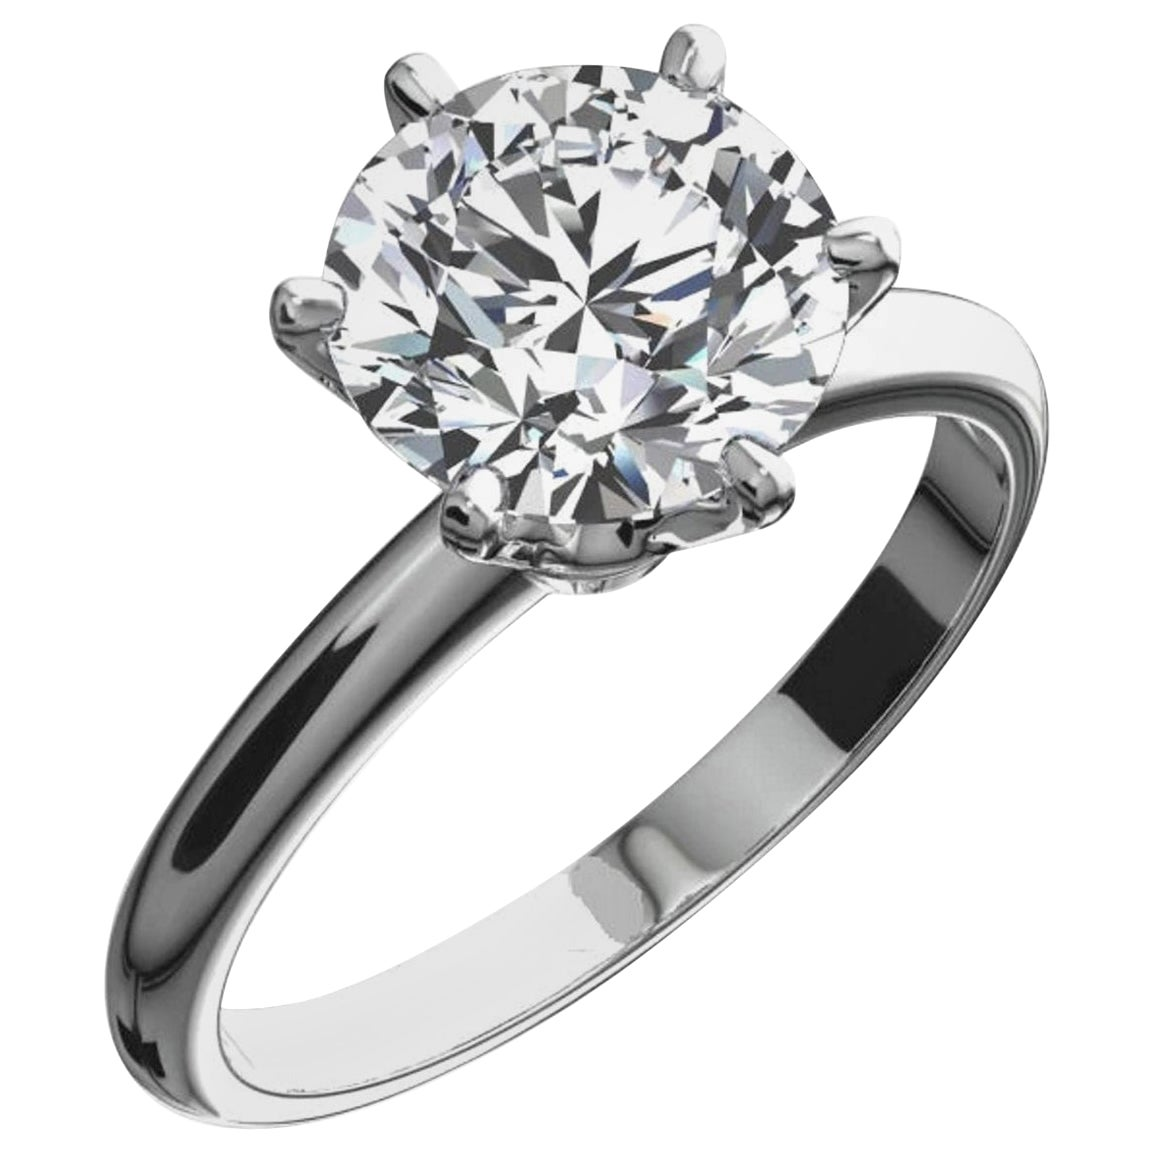 GIA Certified 3.60 Carat Round Brilliant Cut Diamond Platinum Ring VVS1 Clarity